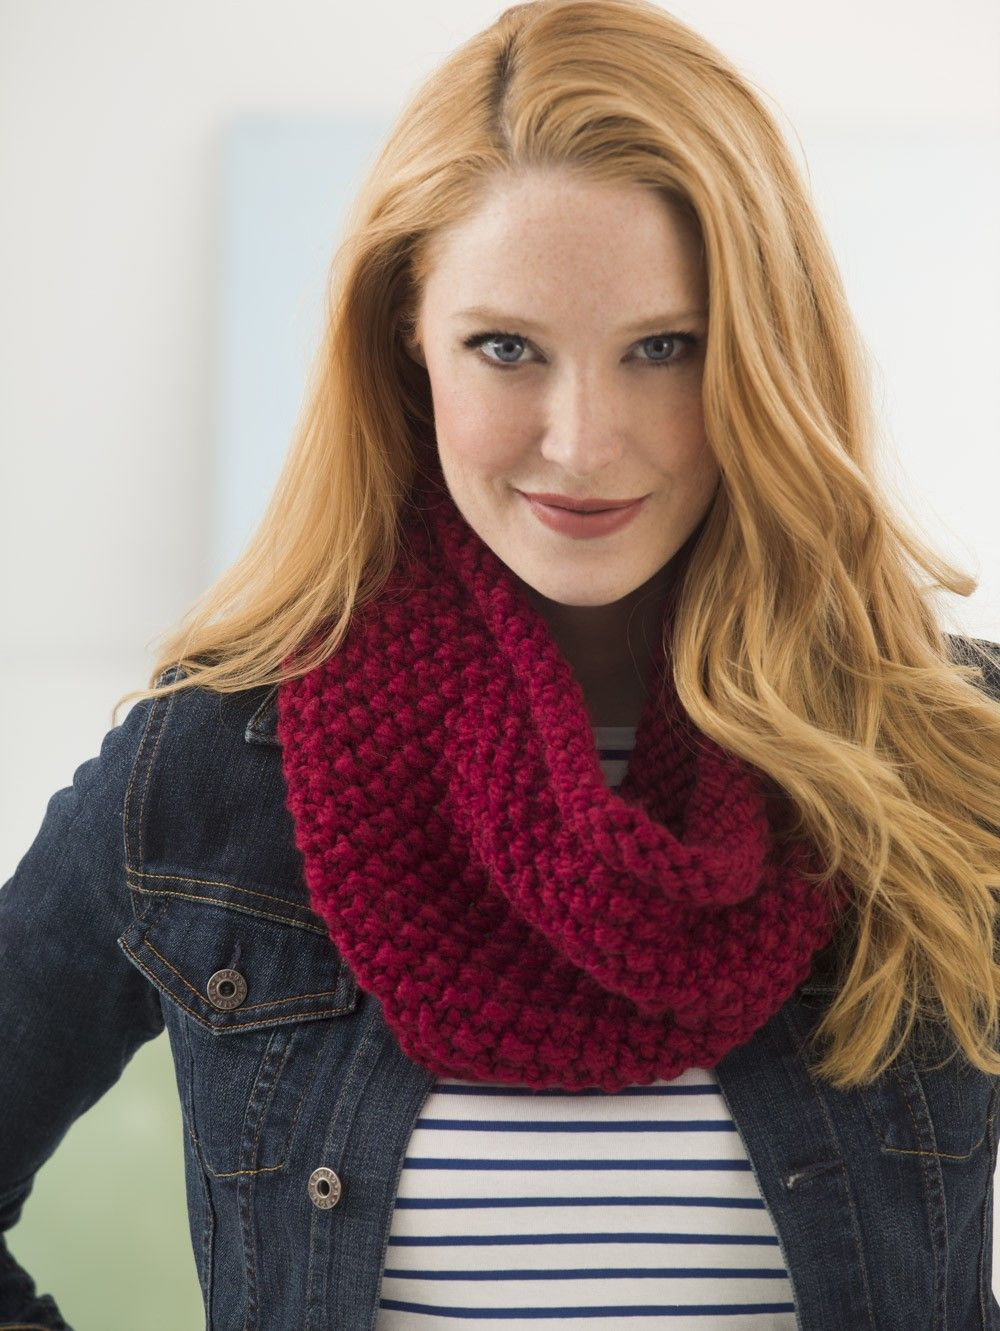 Quick Seed Stitch Cowl (Knit) - Lion Brand Yarn | Knit/Crochet ...